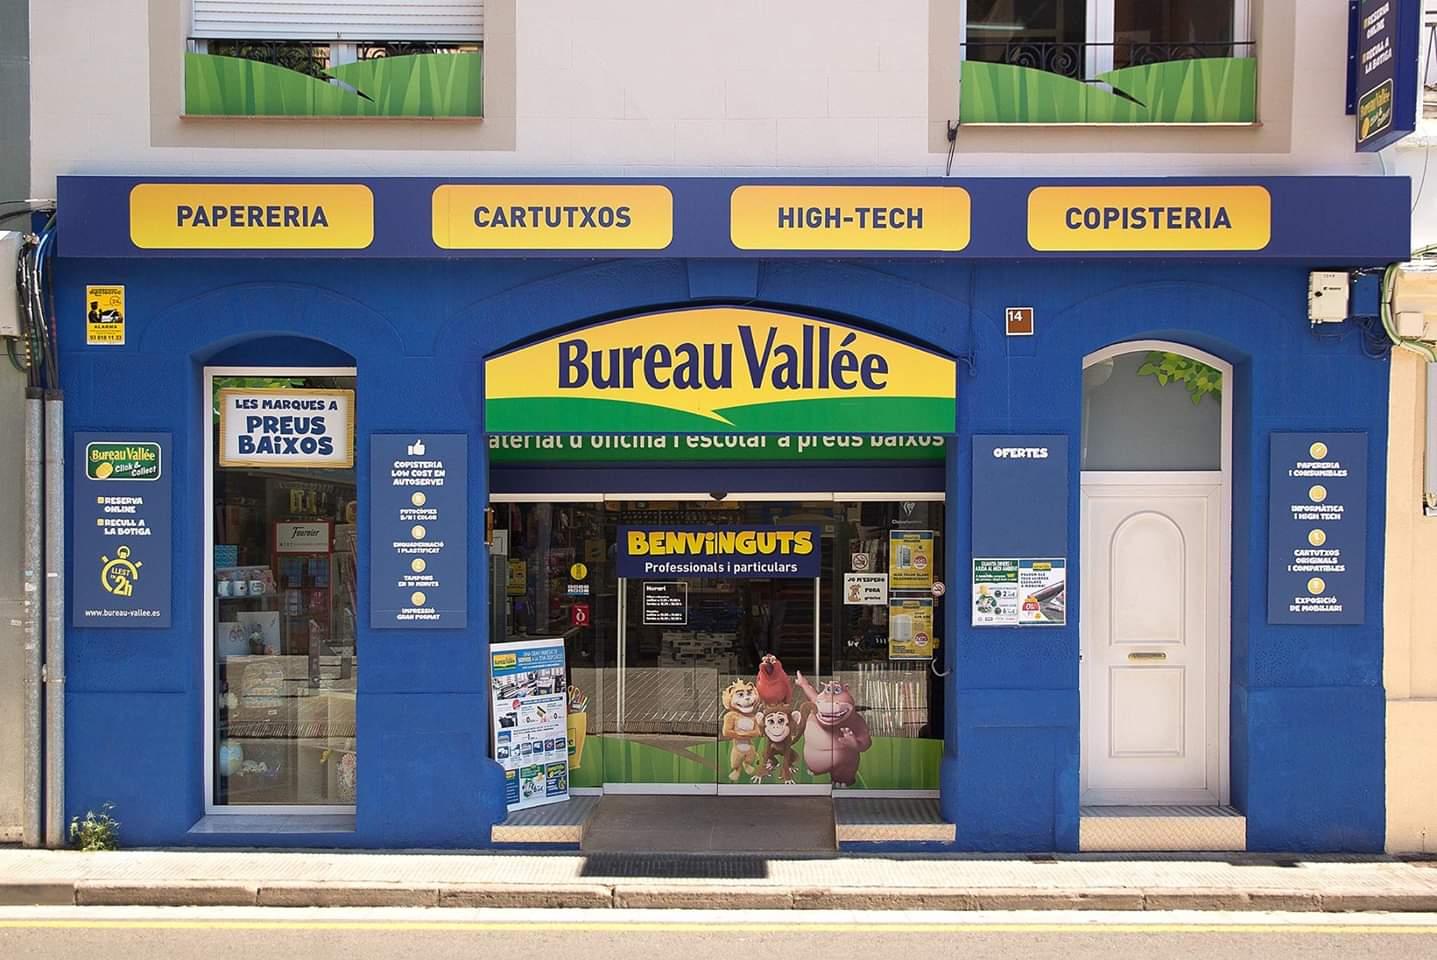 Bureau Vallée <p>Especialistas en papeler&iacute;a, material de oficina y escolar, cartuchos de tinta, t&oacute;ners e inform&aacute;tica. Mobiliario y sillas de oficina. Copister&iacute;a</p>